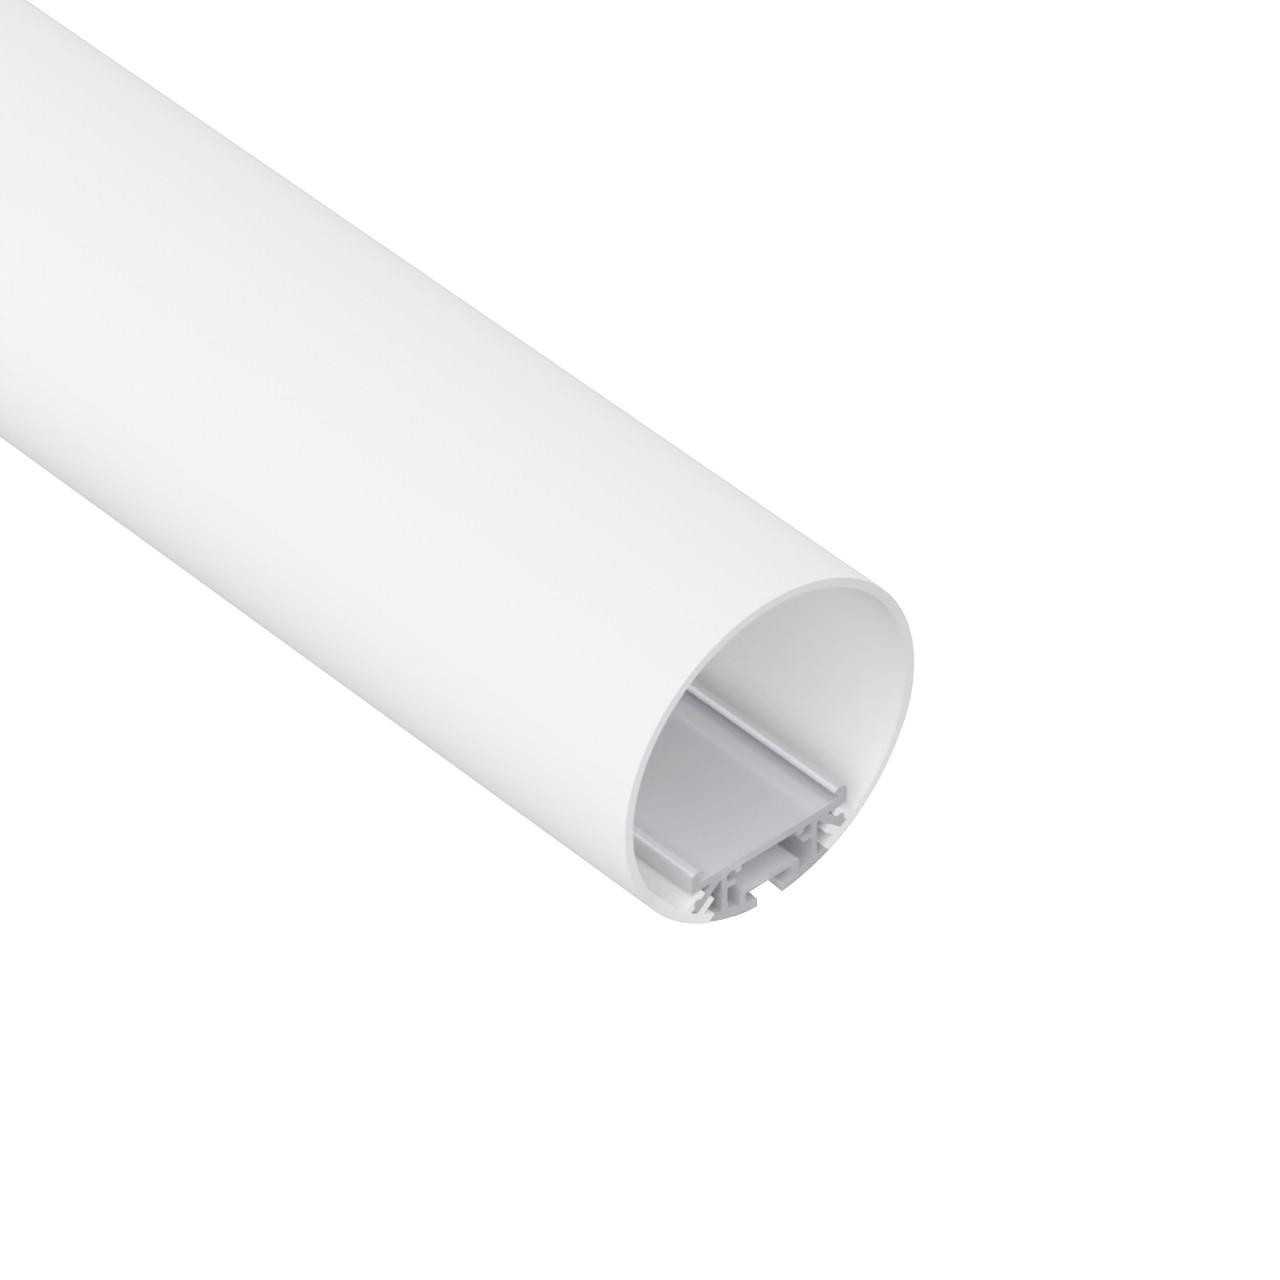 R60 Suspenderet Tube LED profil til LED Strip dia 60mm